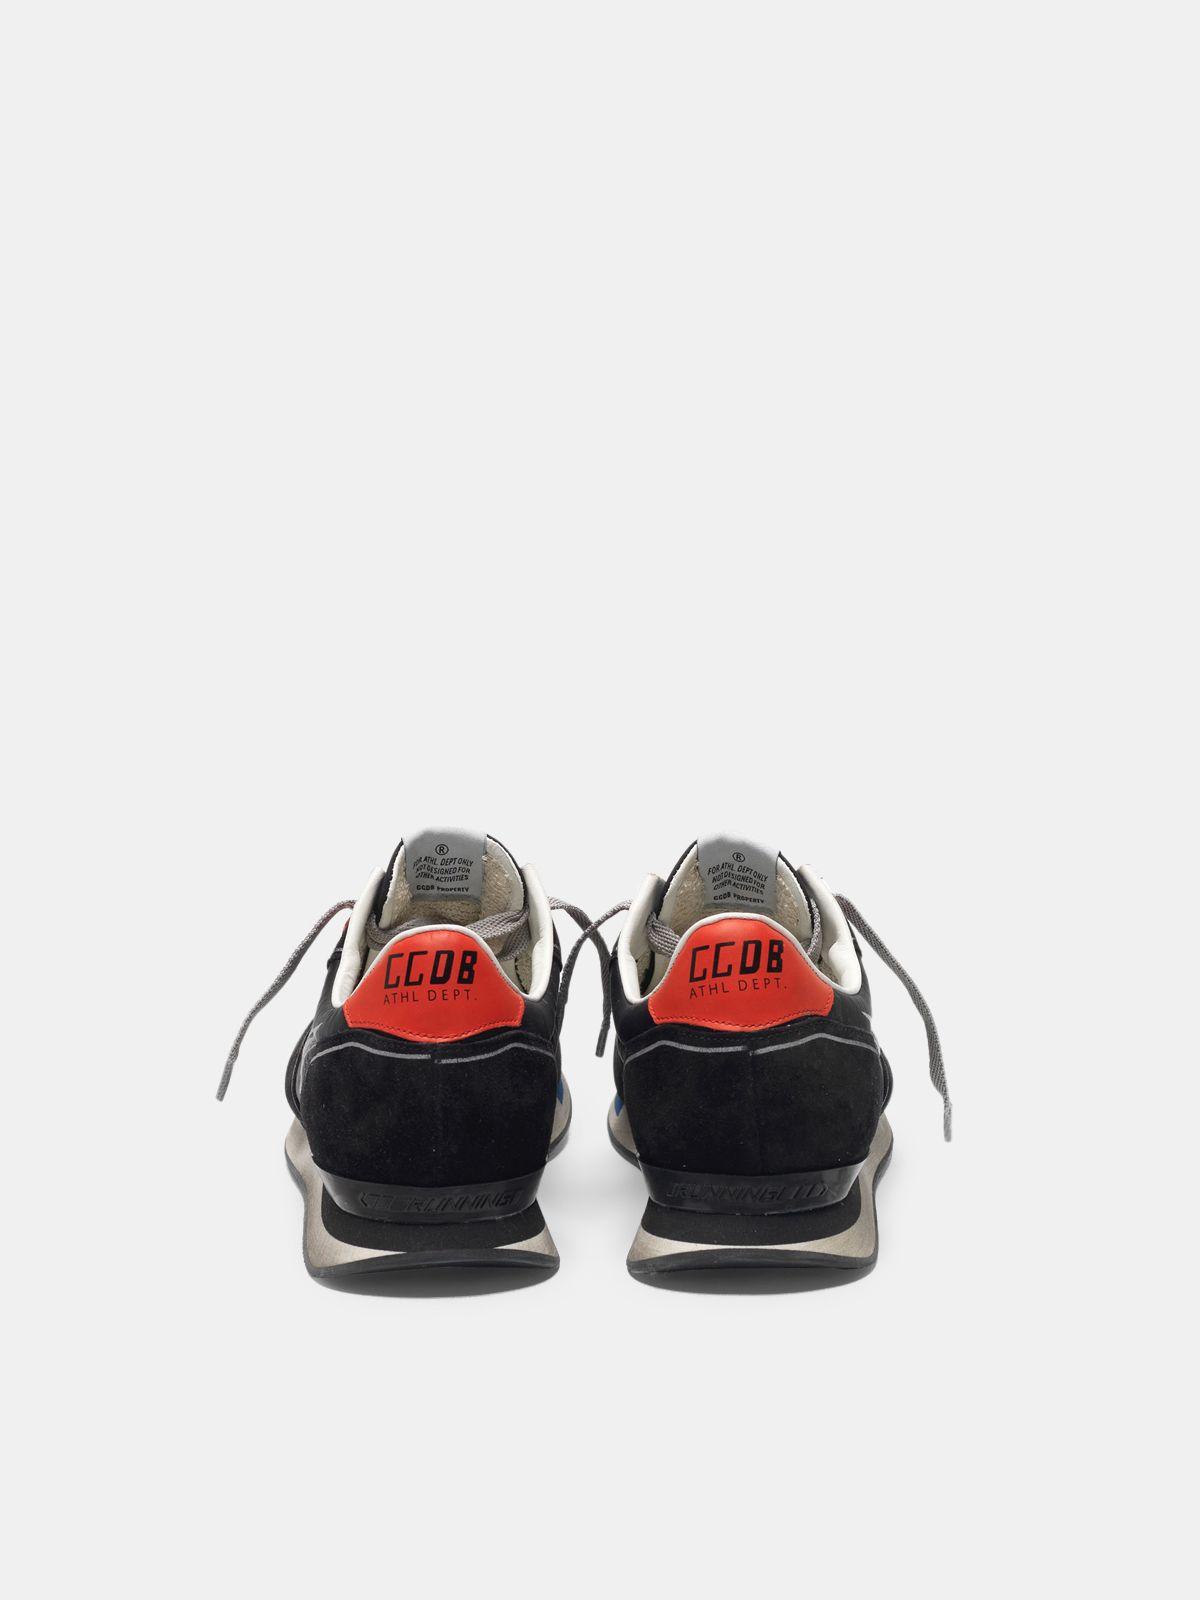 Golden Goose - Sneakers running in black suede con stella a contrasto in